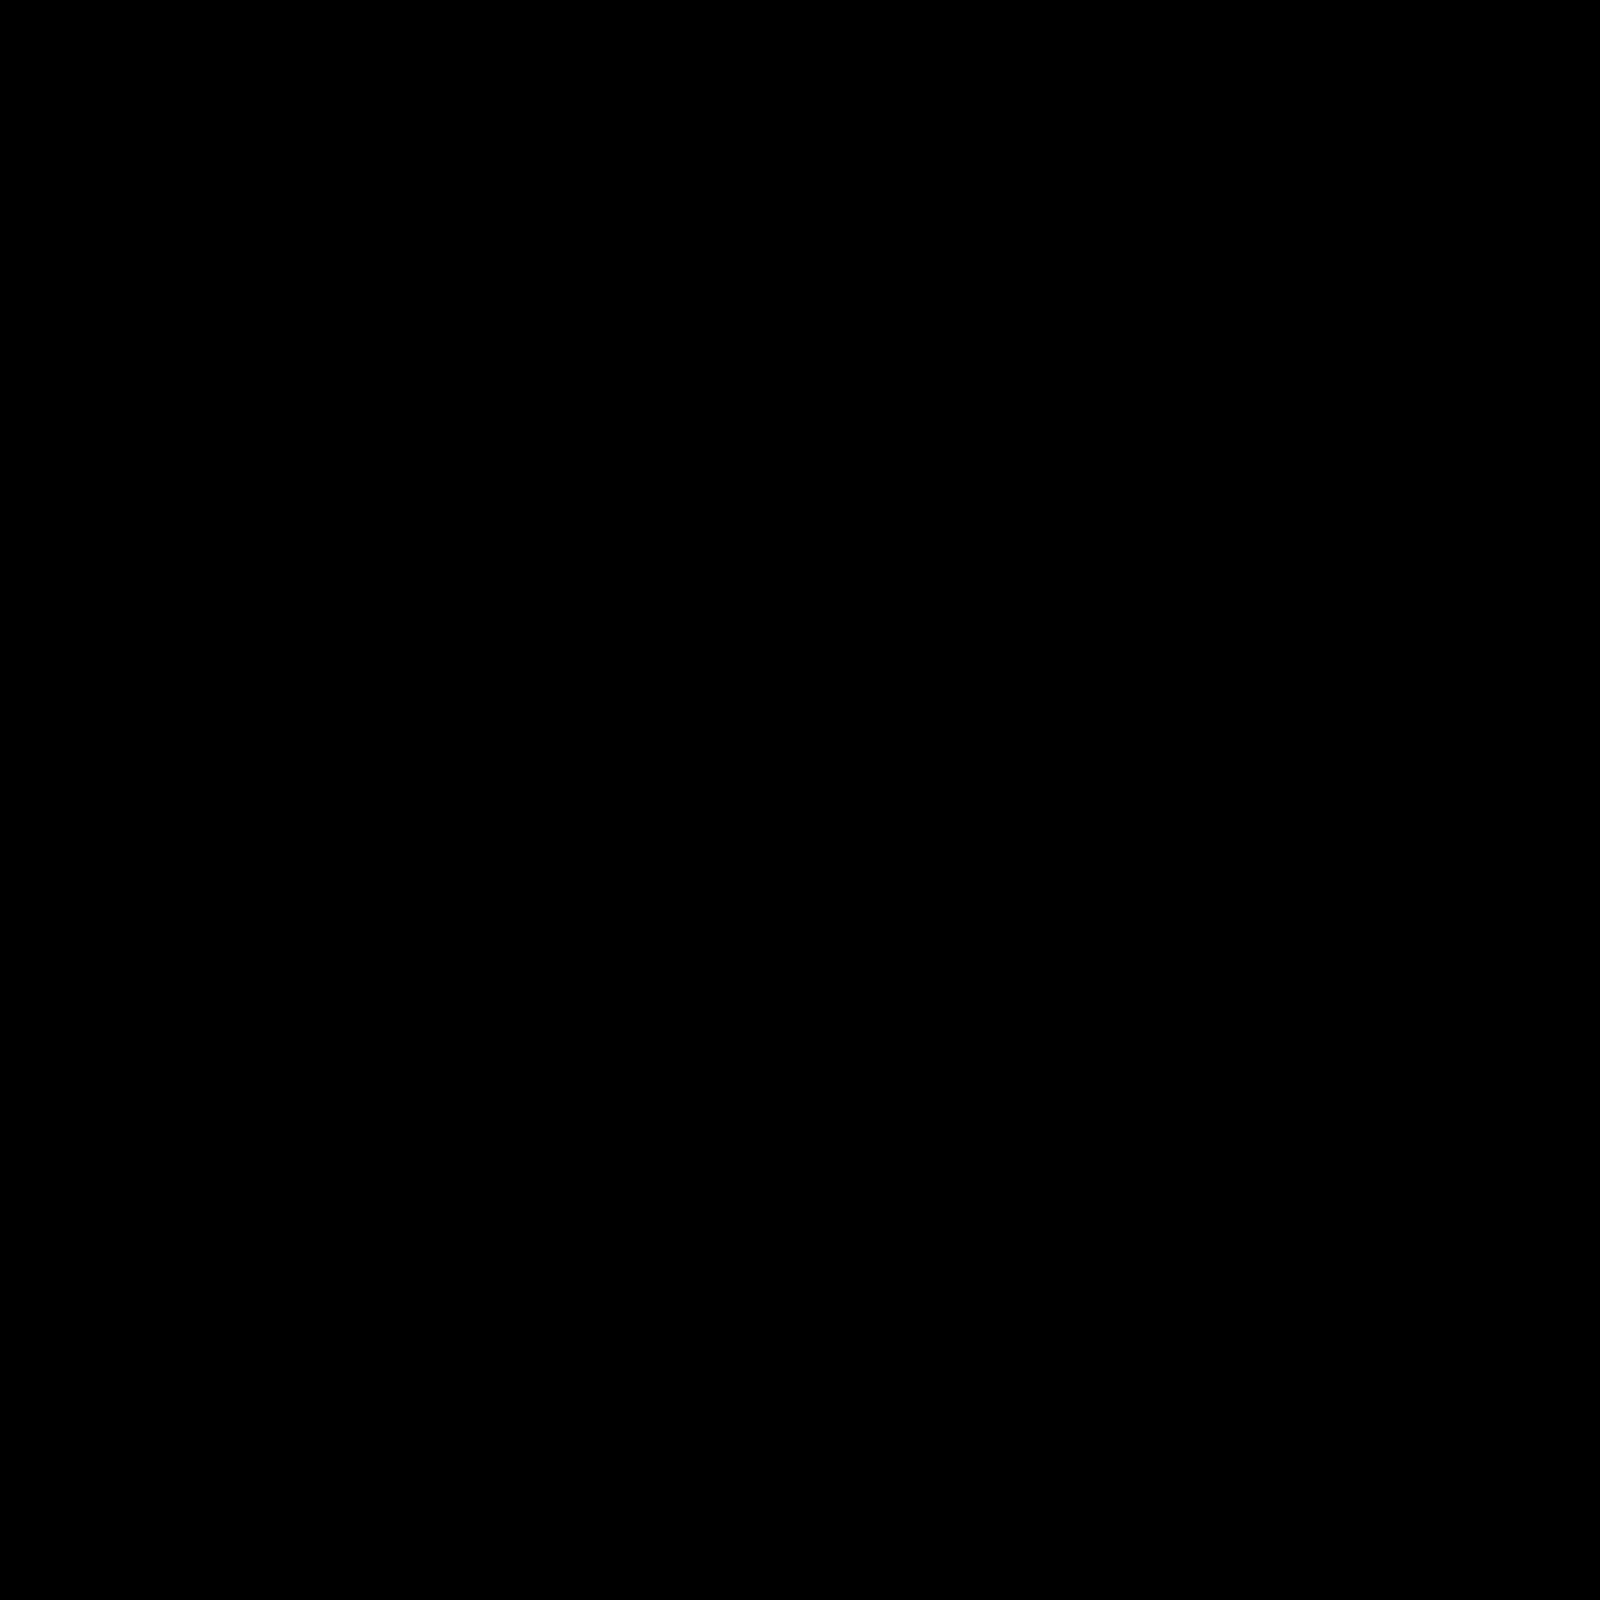 Turn off Ringer icon